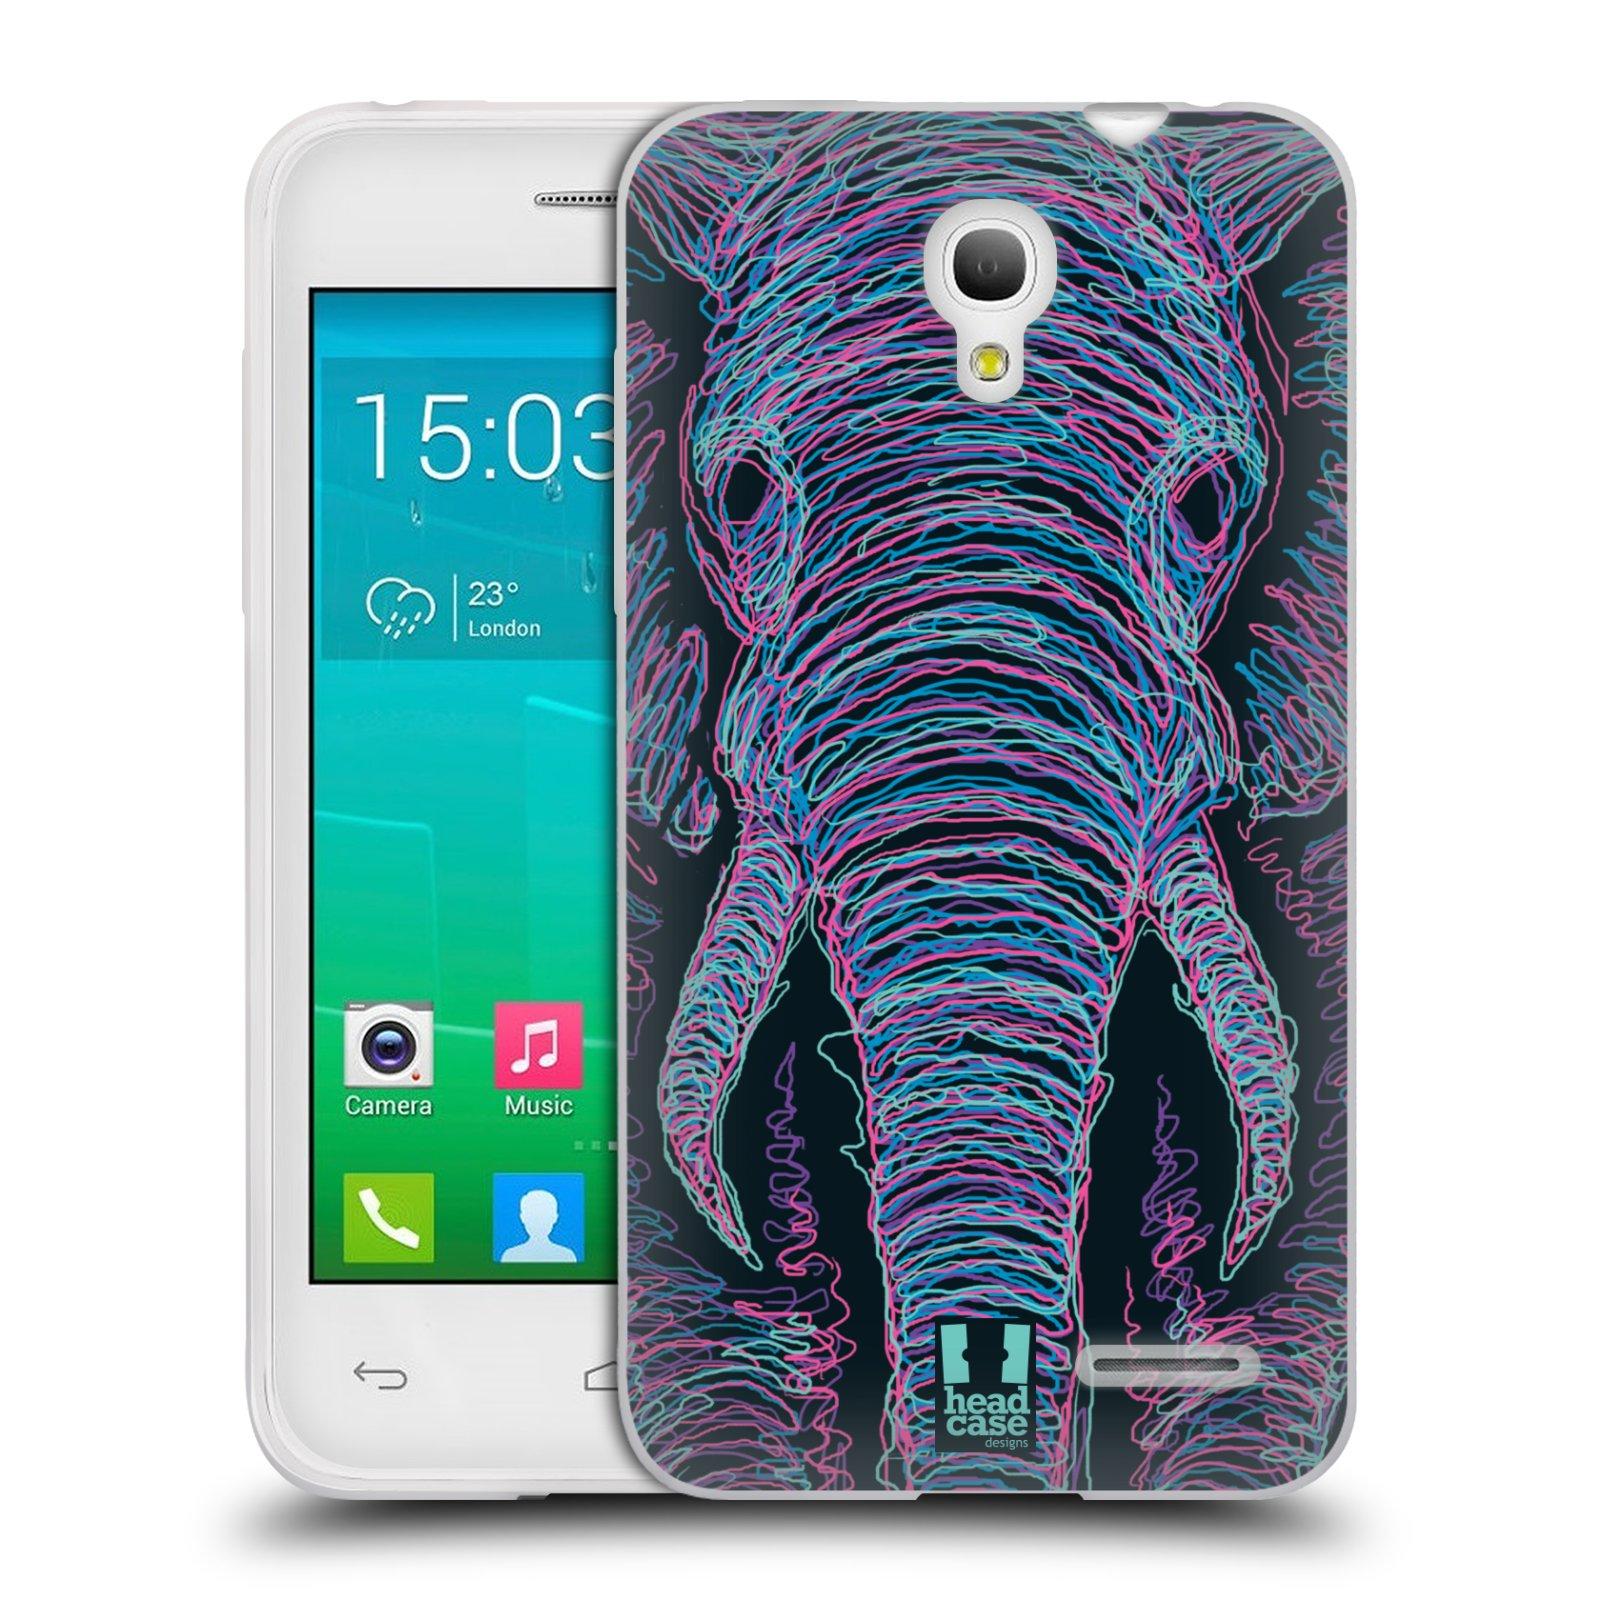 HEAD CASE silikonový obal na mobil Alcatel POP S3 OT-5050Y vzor zvíře čmáranice slon